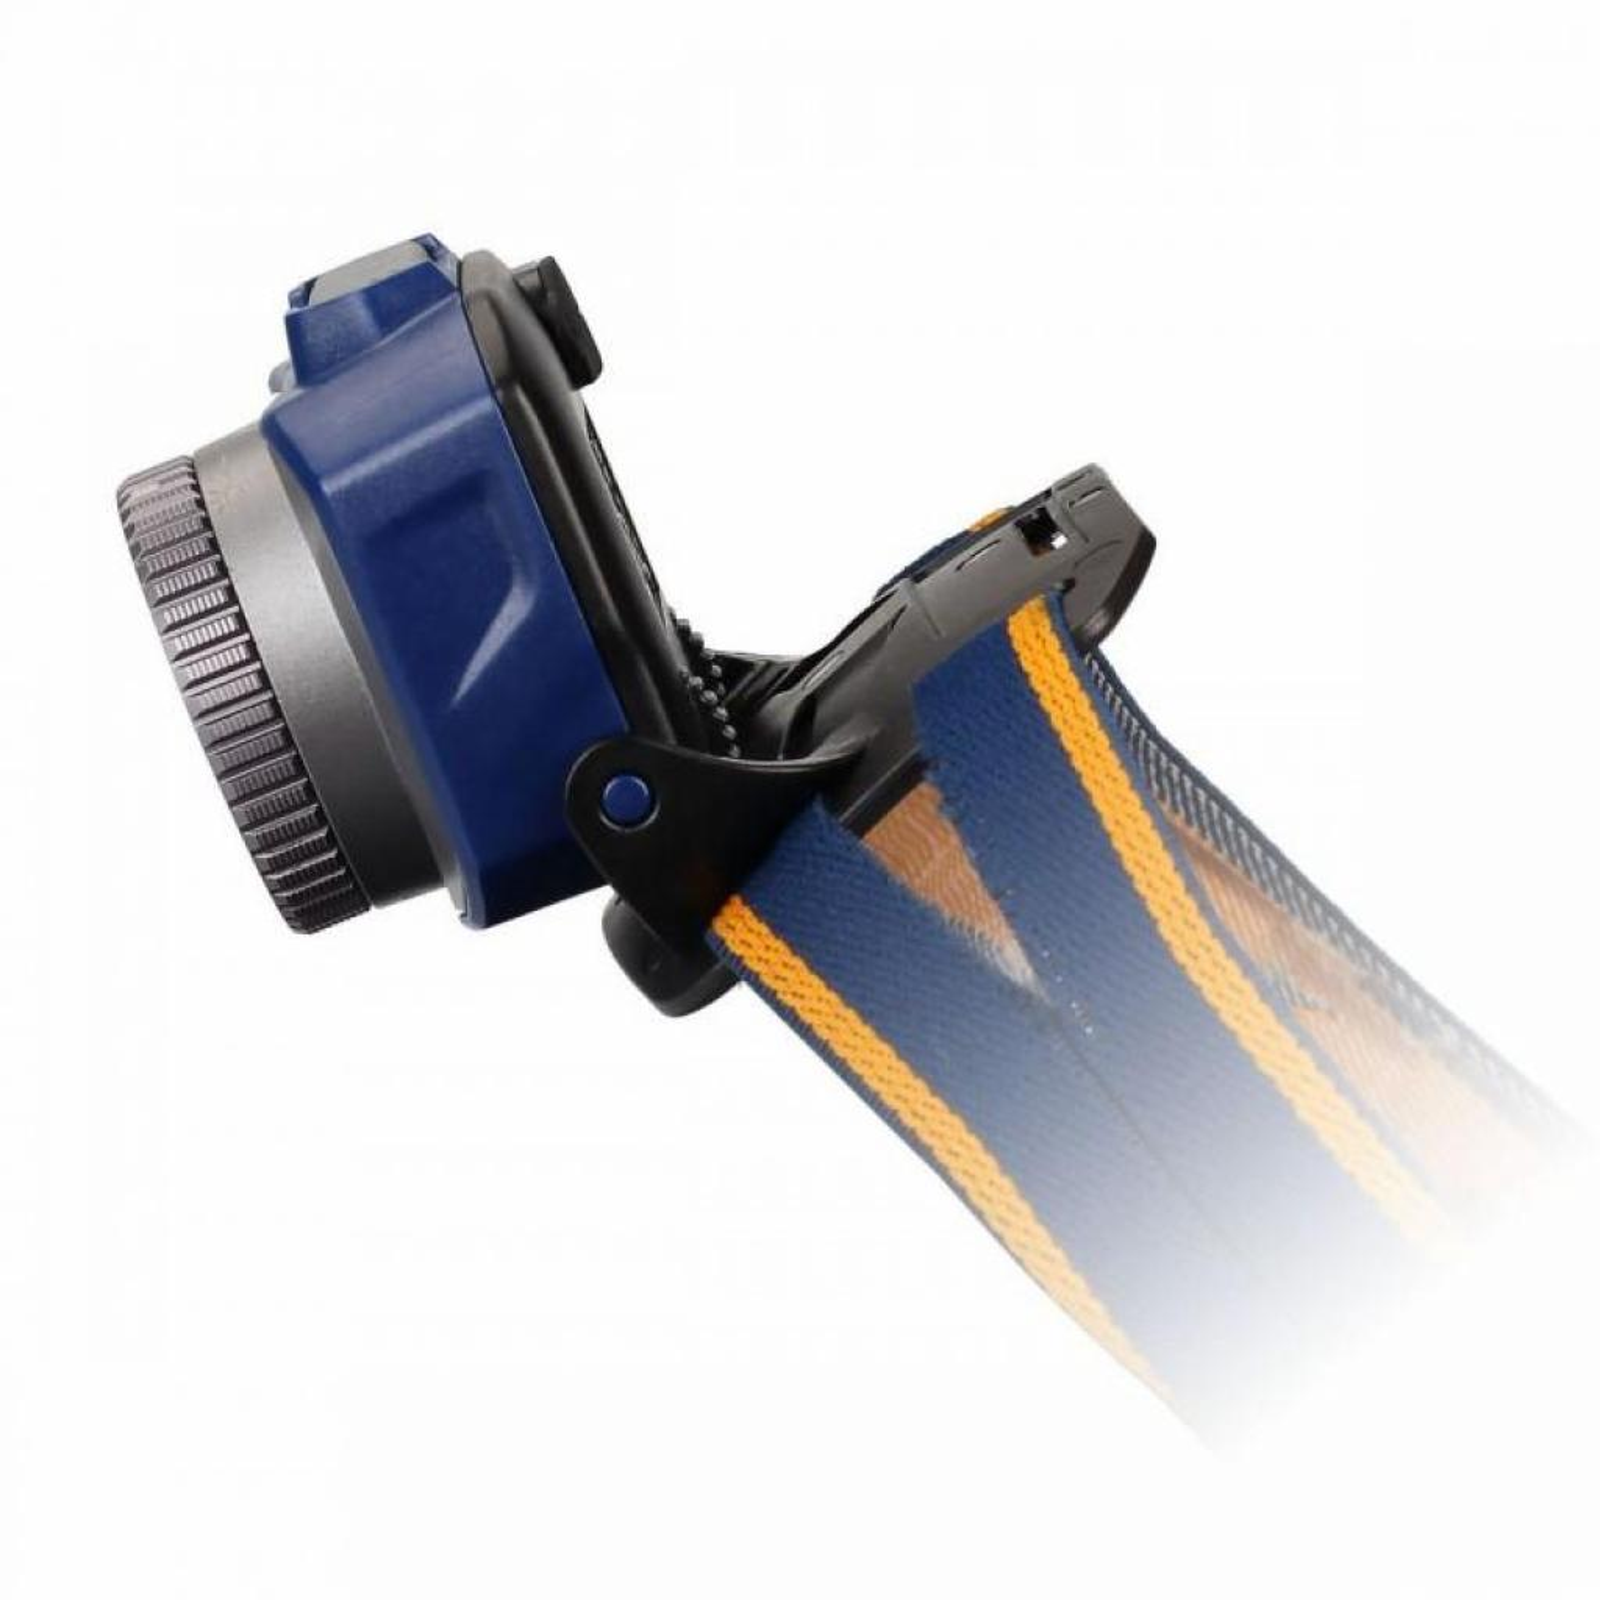 Фонарь Fenix HL40R Cree XP-LHIV2 LED синий (HL40RBL) изображение 7